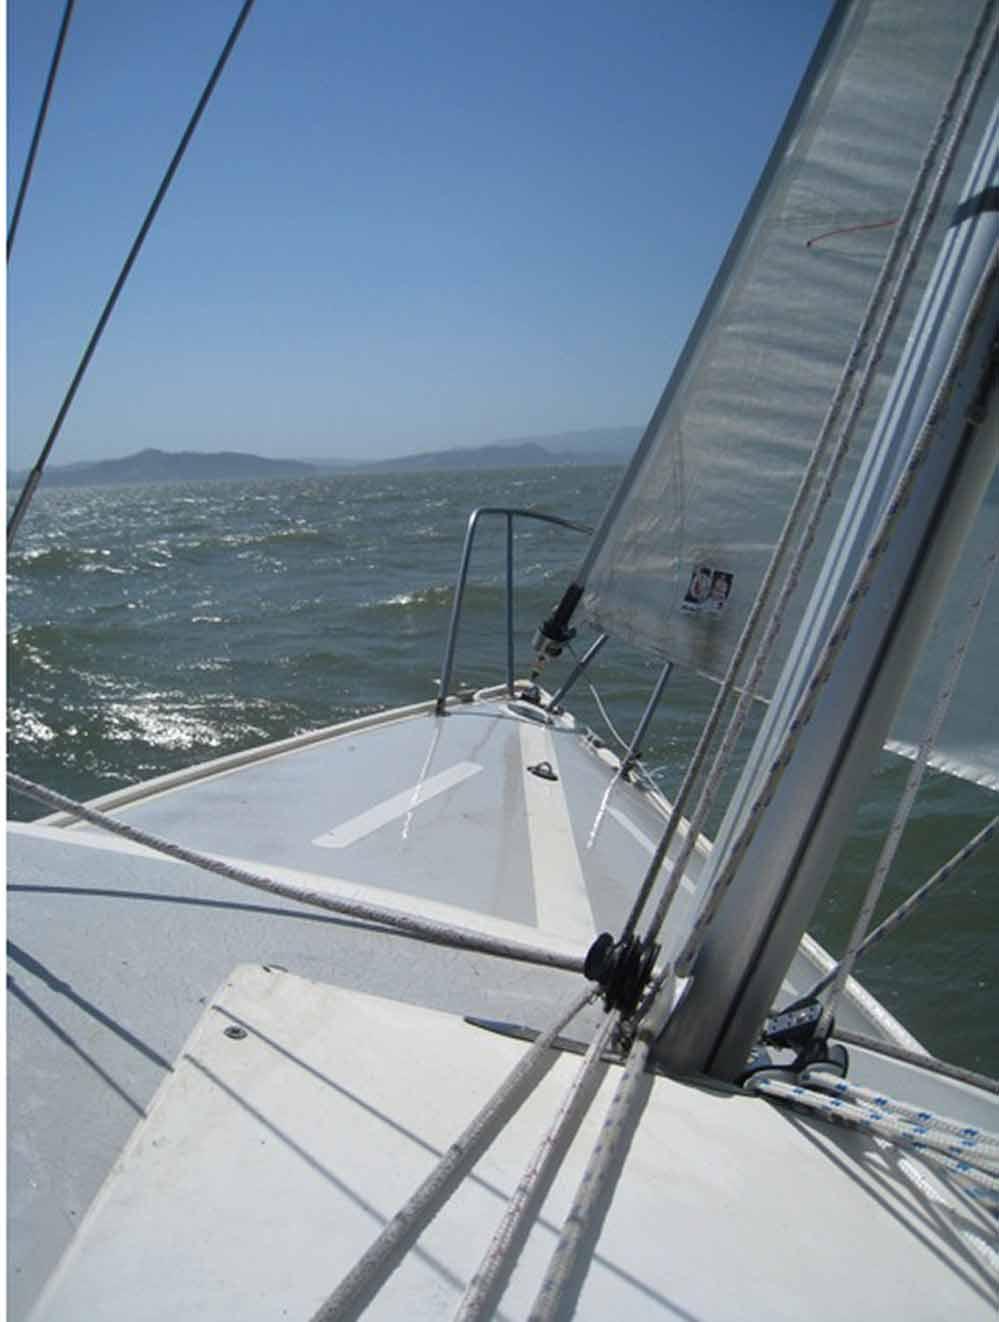 Pink ROSES trimming SAILBOAT Sails Vines Ocean Waves Seagulls Antique ART PRINT